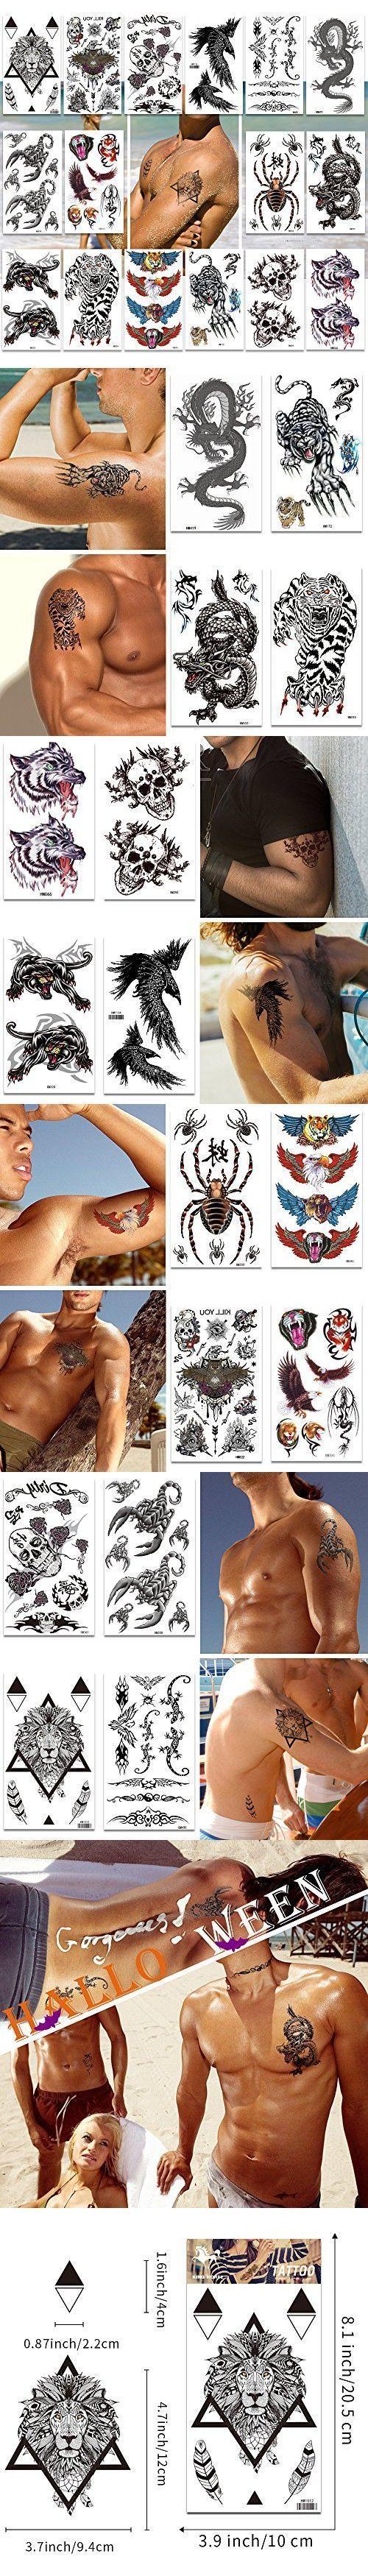 Temporäre Tattoos Packung mit 16 Blättern für Männer Teens Guys Boys Große … – Tattoo